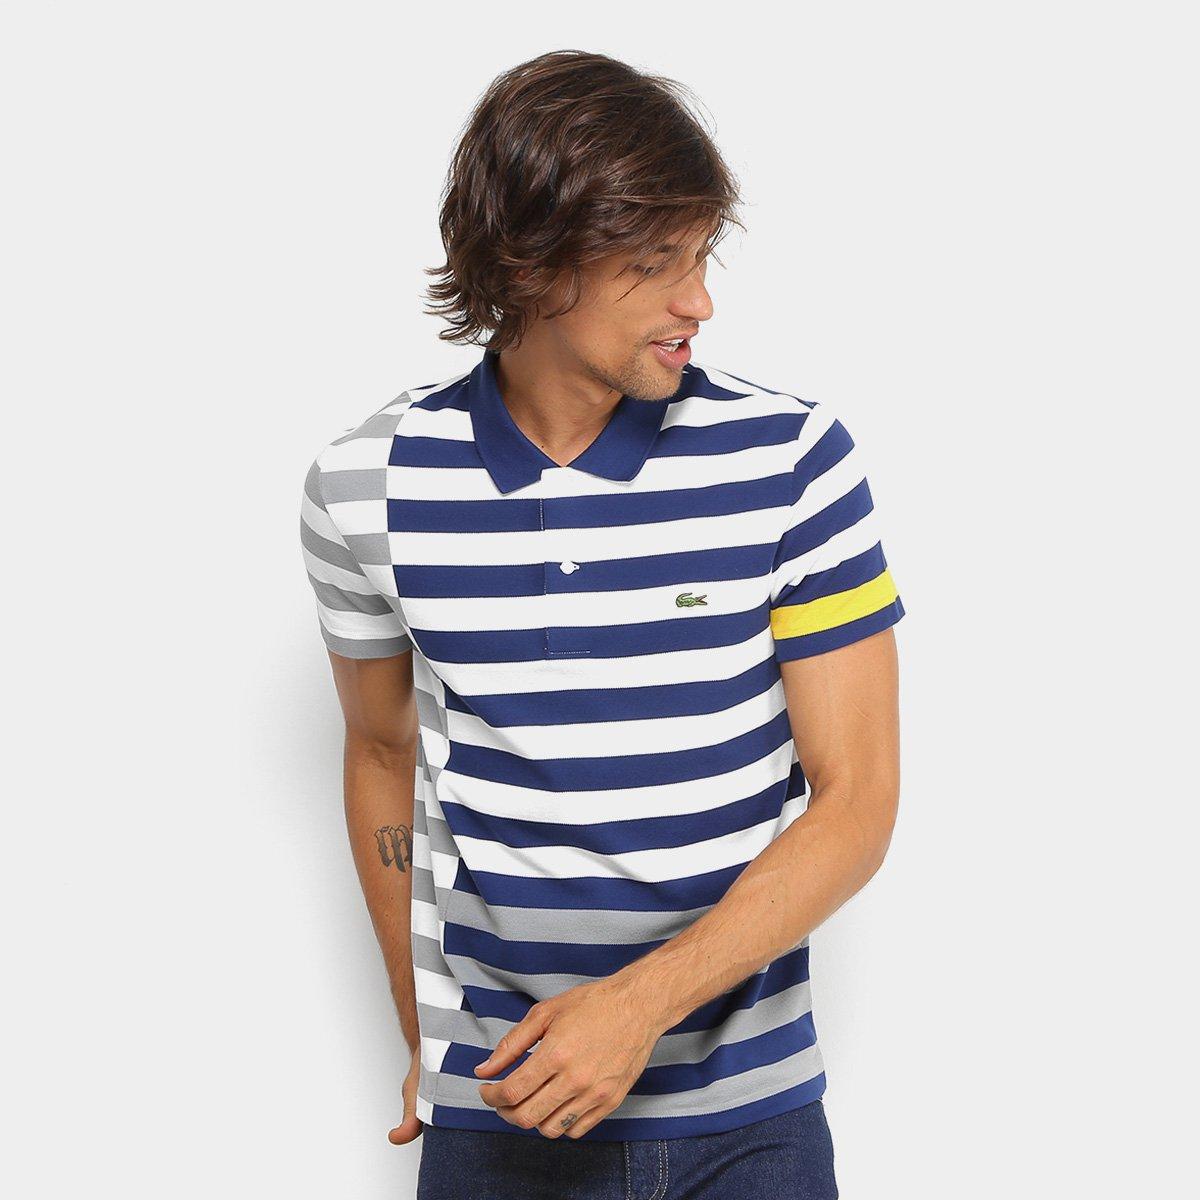 852977c9023fd Camisa Polo Lacoste Piquet Recorte Listras Striped Masculina ...